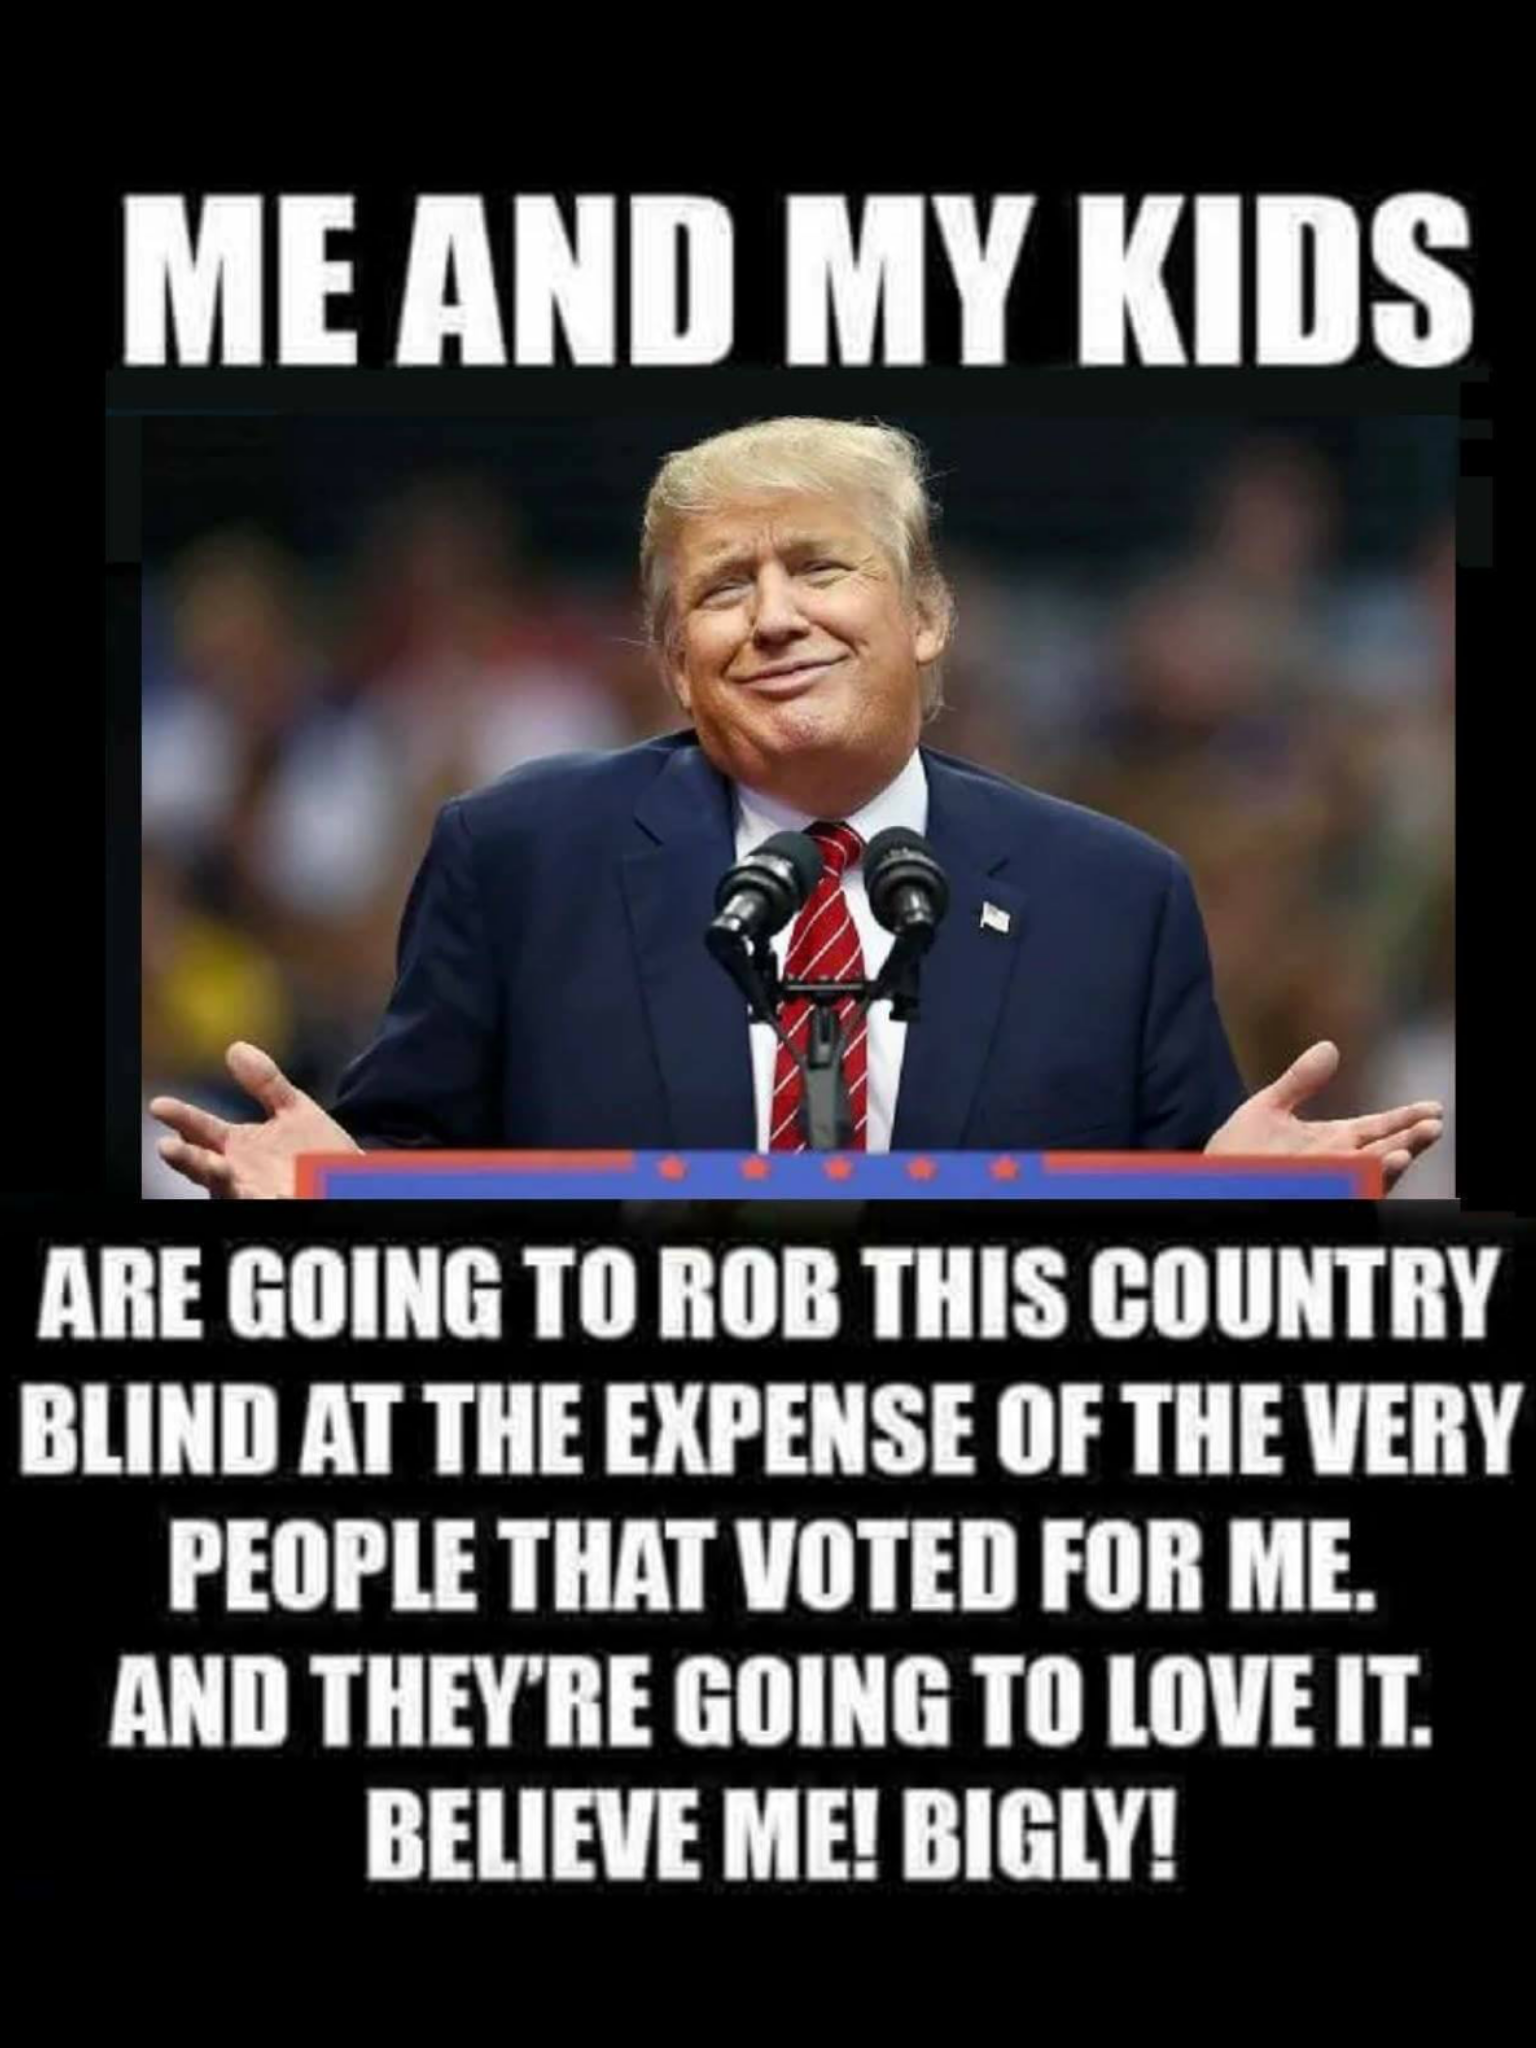 fb9103f8974d42a56449183dde4bb013 robbing america blind!!! mmmmhmmm pinterest politics, truths